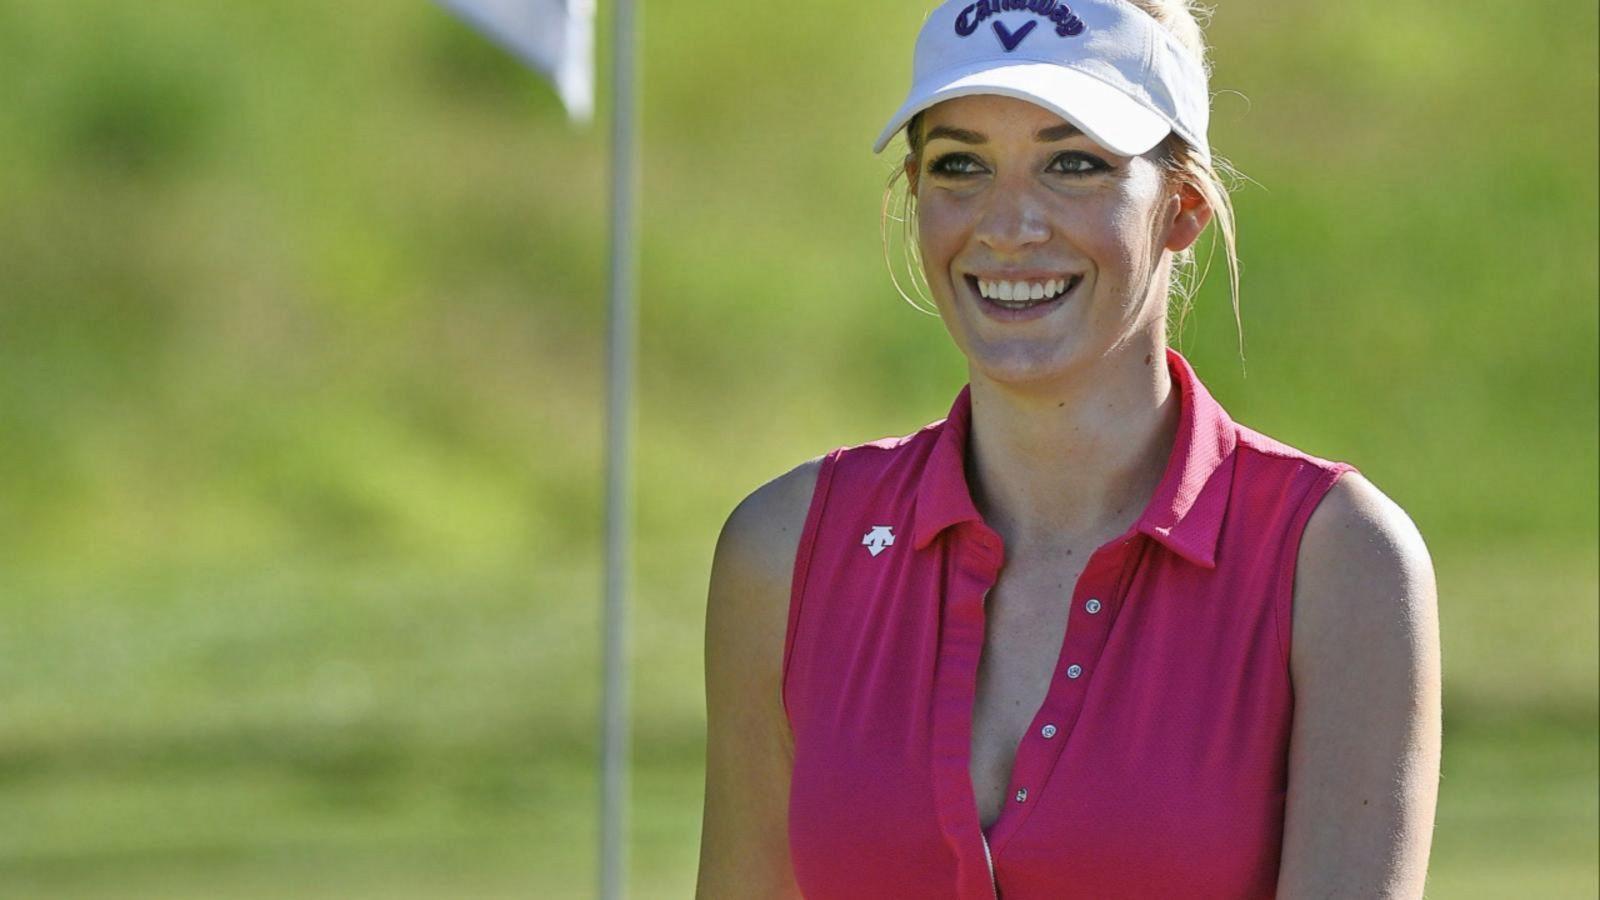 Woman playing golf